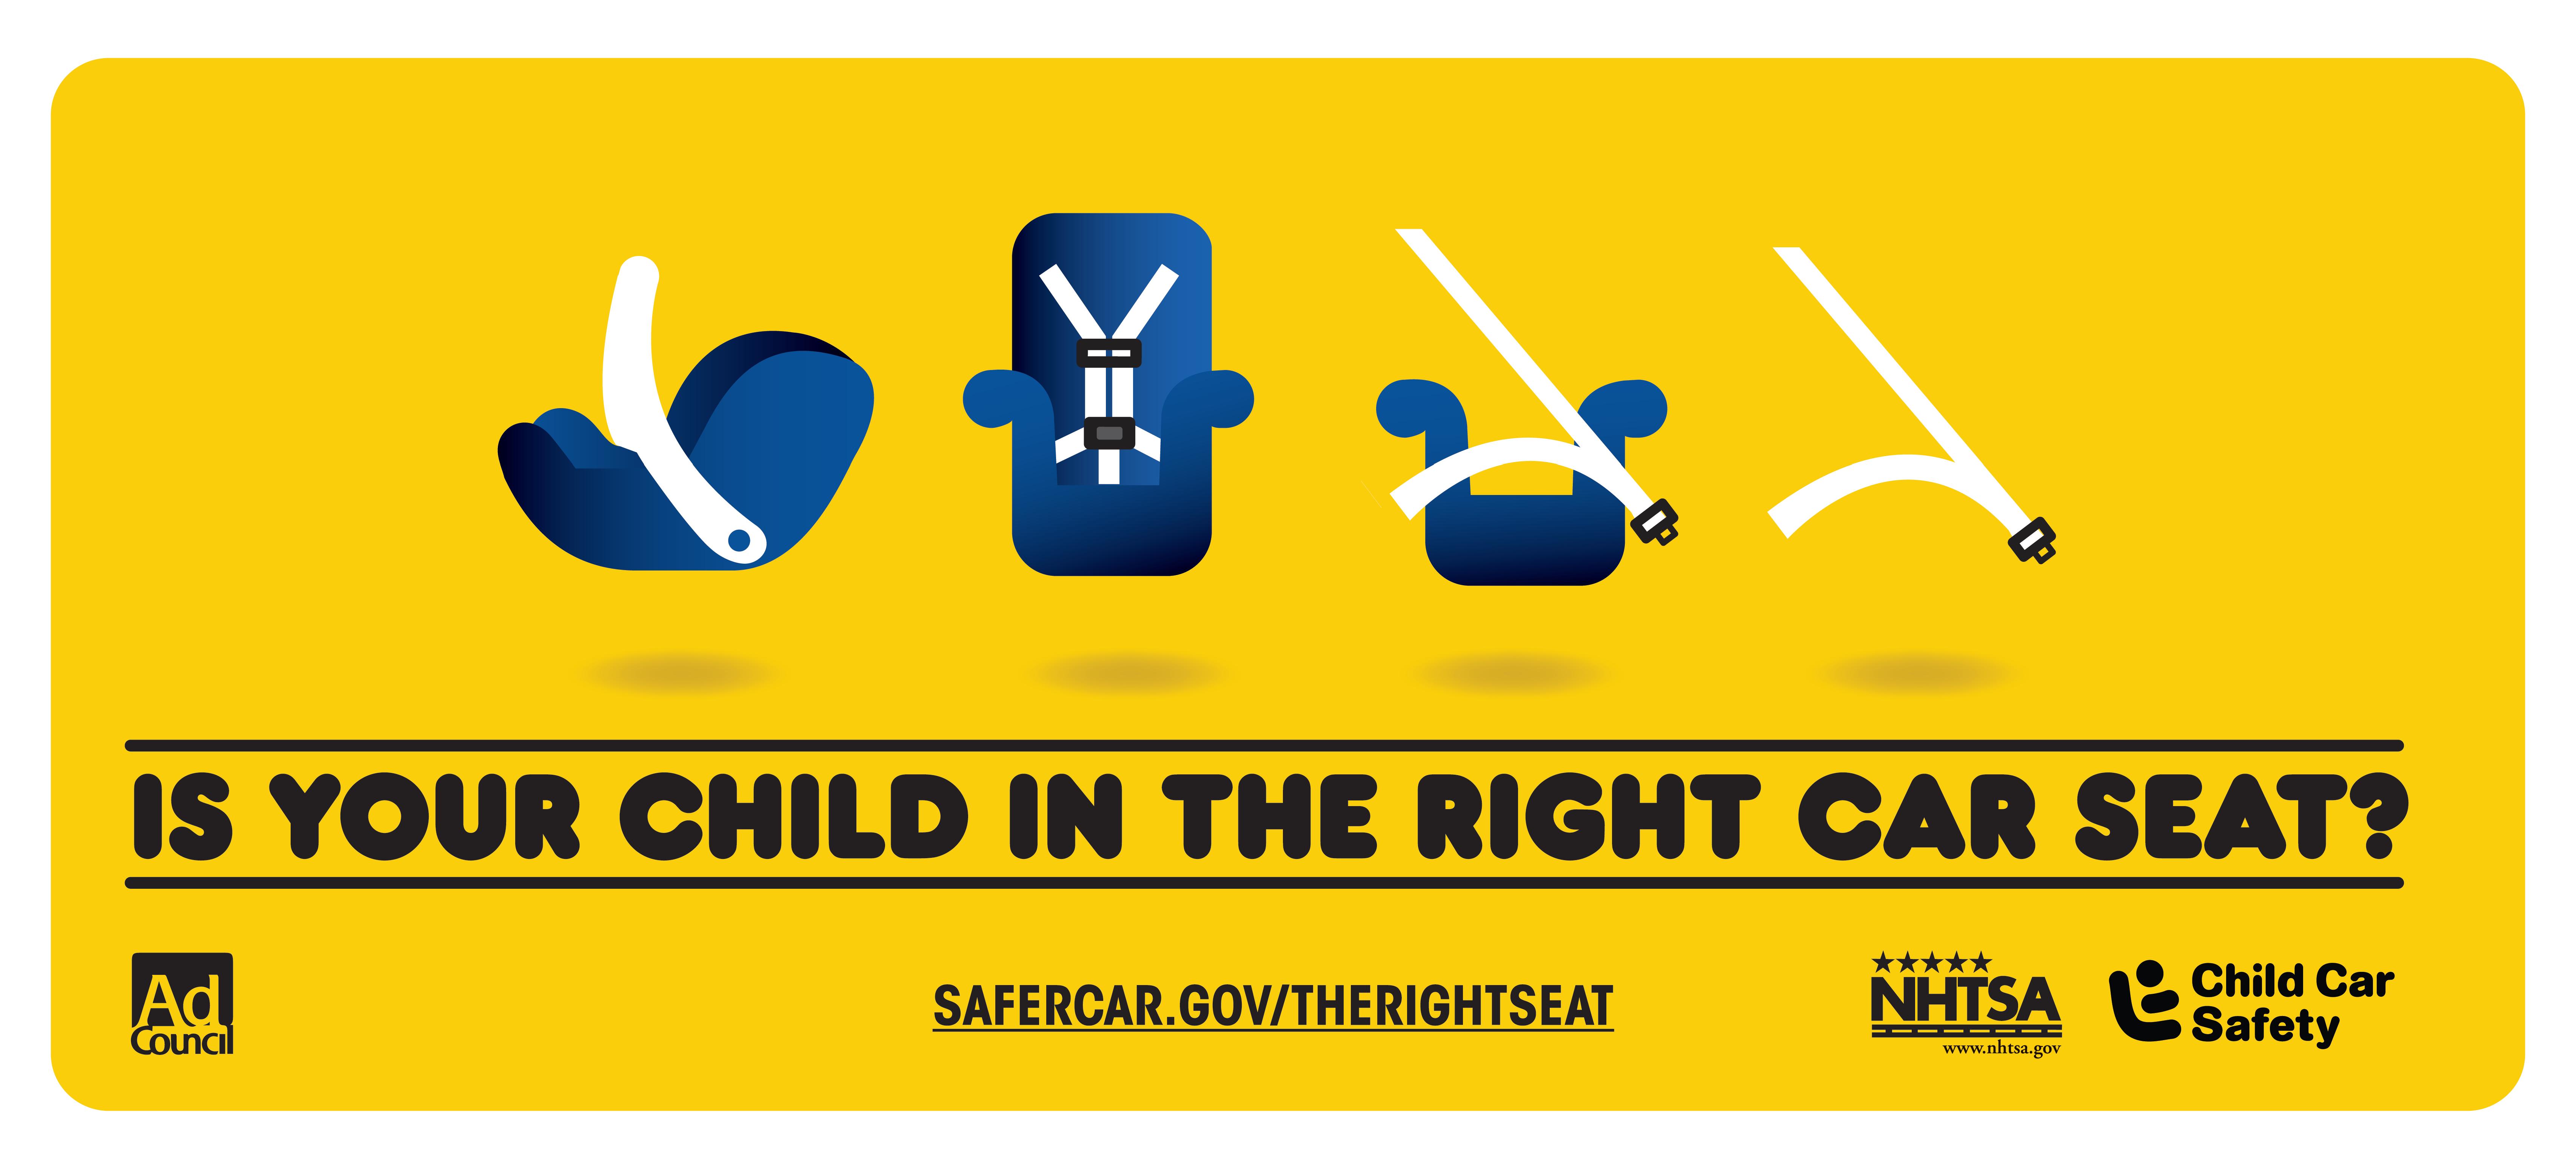 Safe Car Gov >> Cps Week Blog Outreach